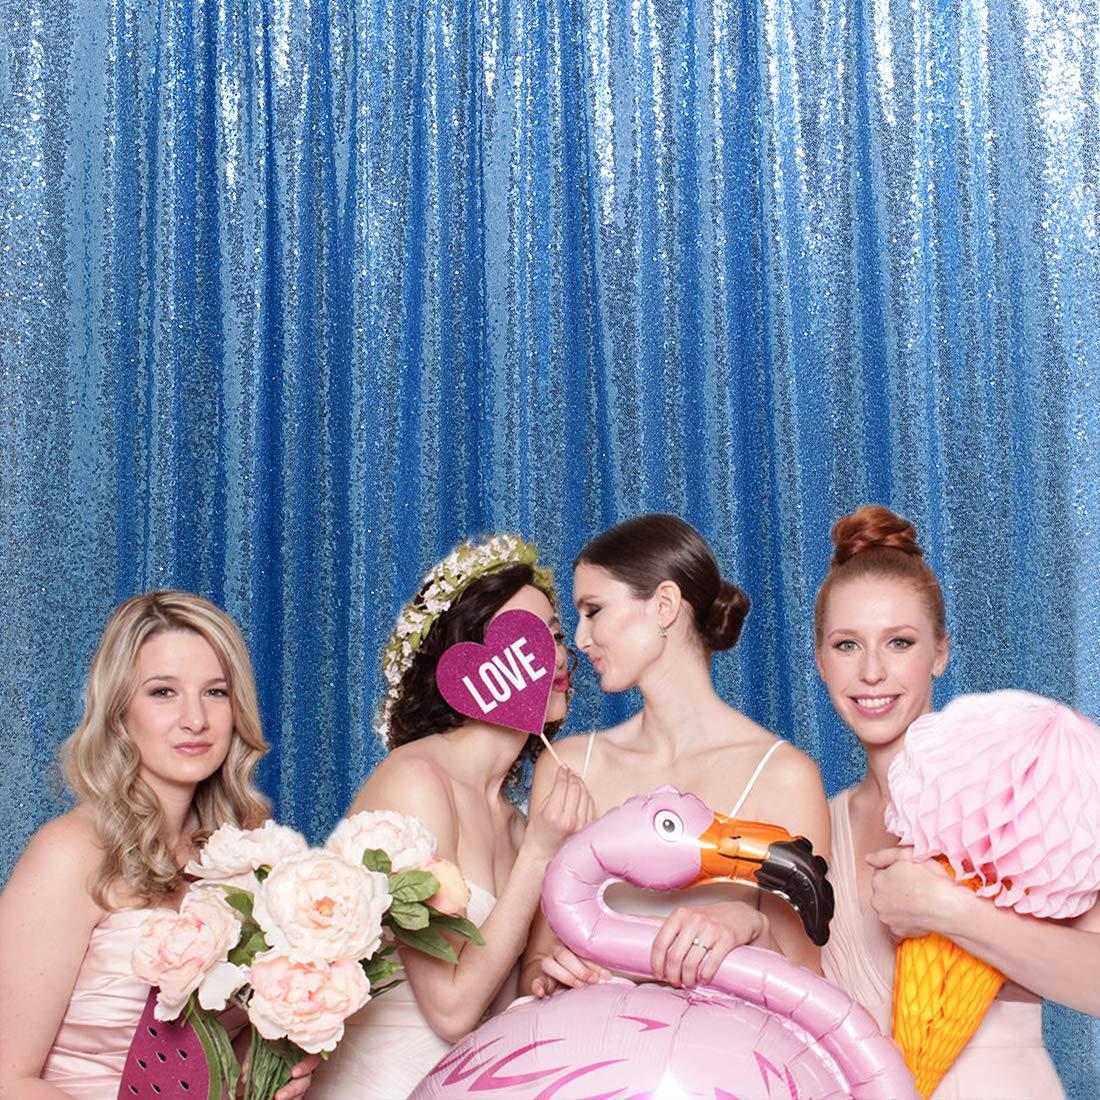 7ftx7ft Baby Blue Curtain Backdrop Sequin Backdrop Photography Shiny Glitter Prom Backdrop Glitter Drapes